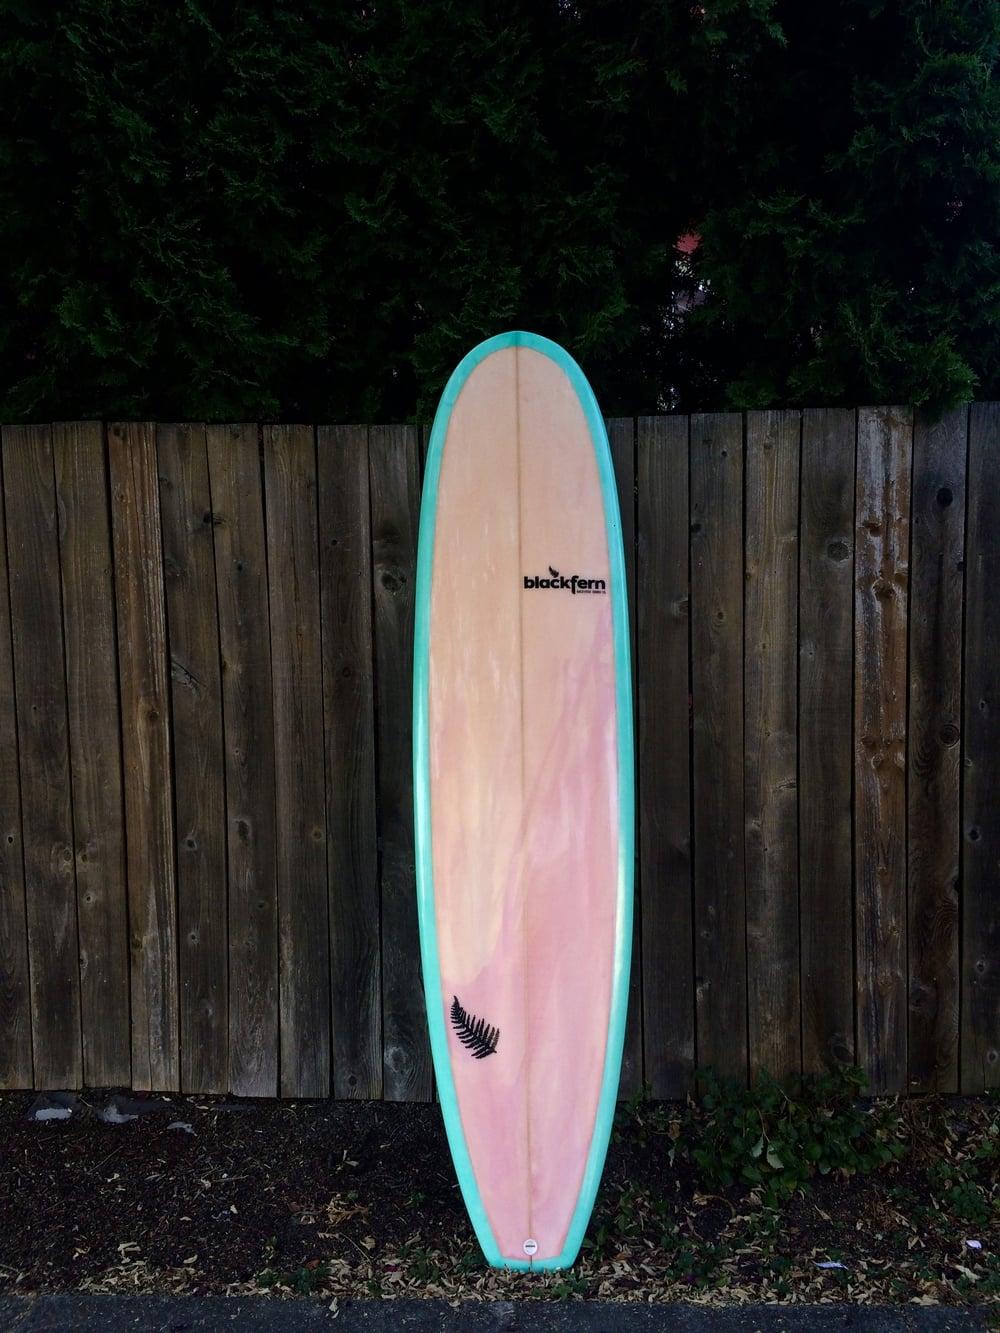 blackfern surfboard